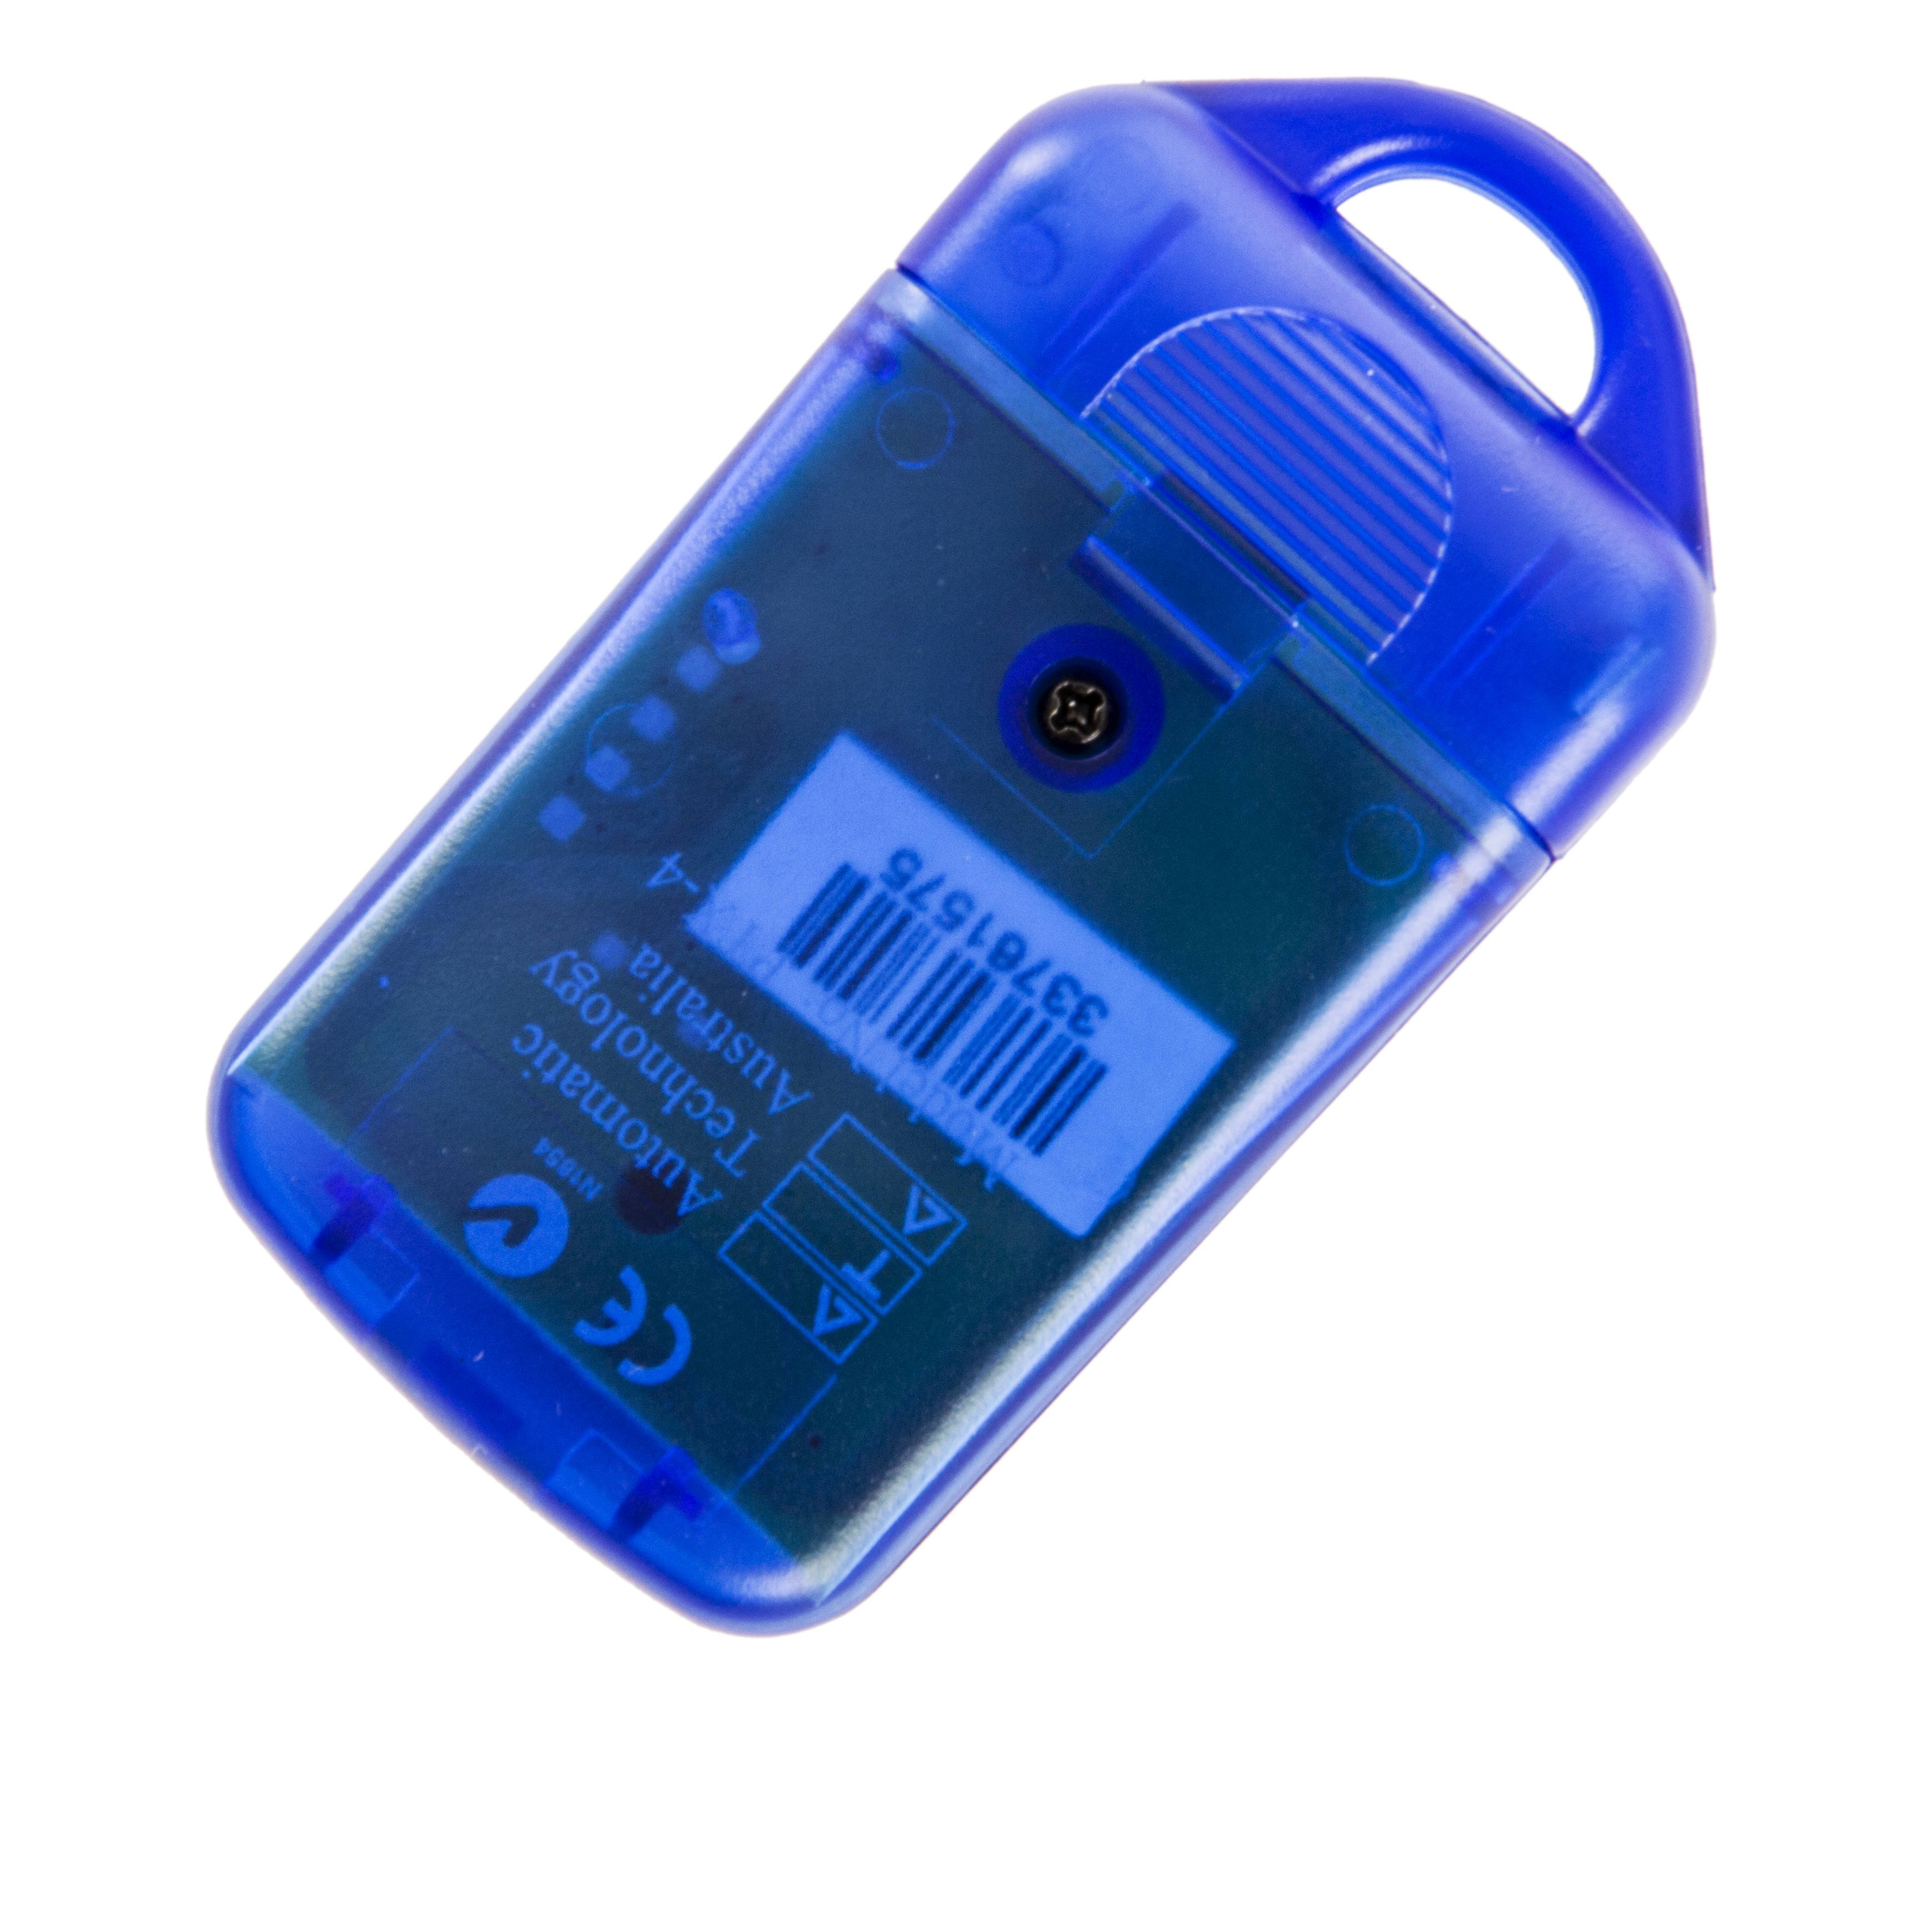 Ata Ptx4 Blue Garage Door Remote Securacode Securalift